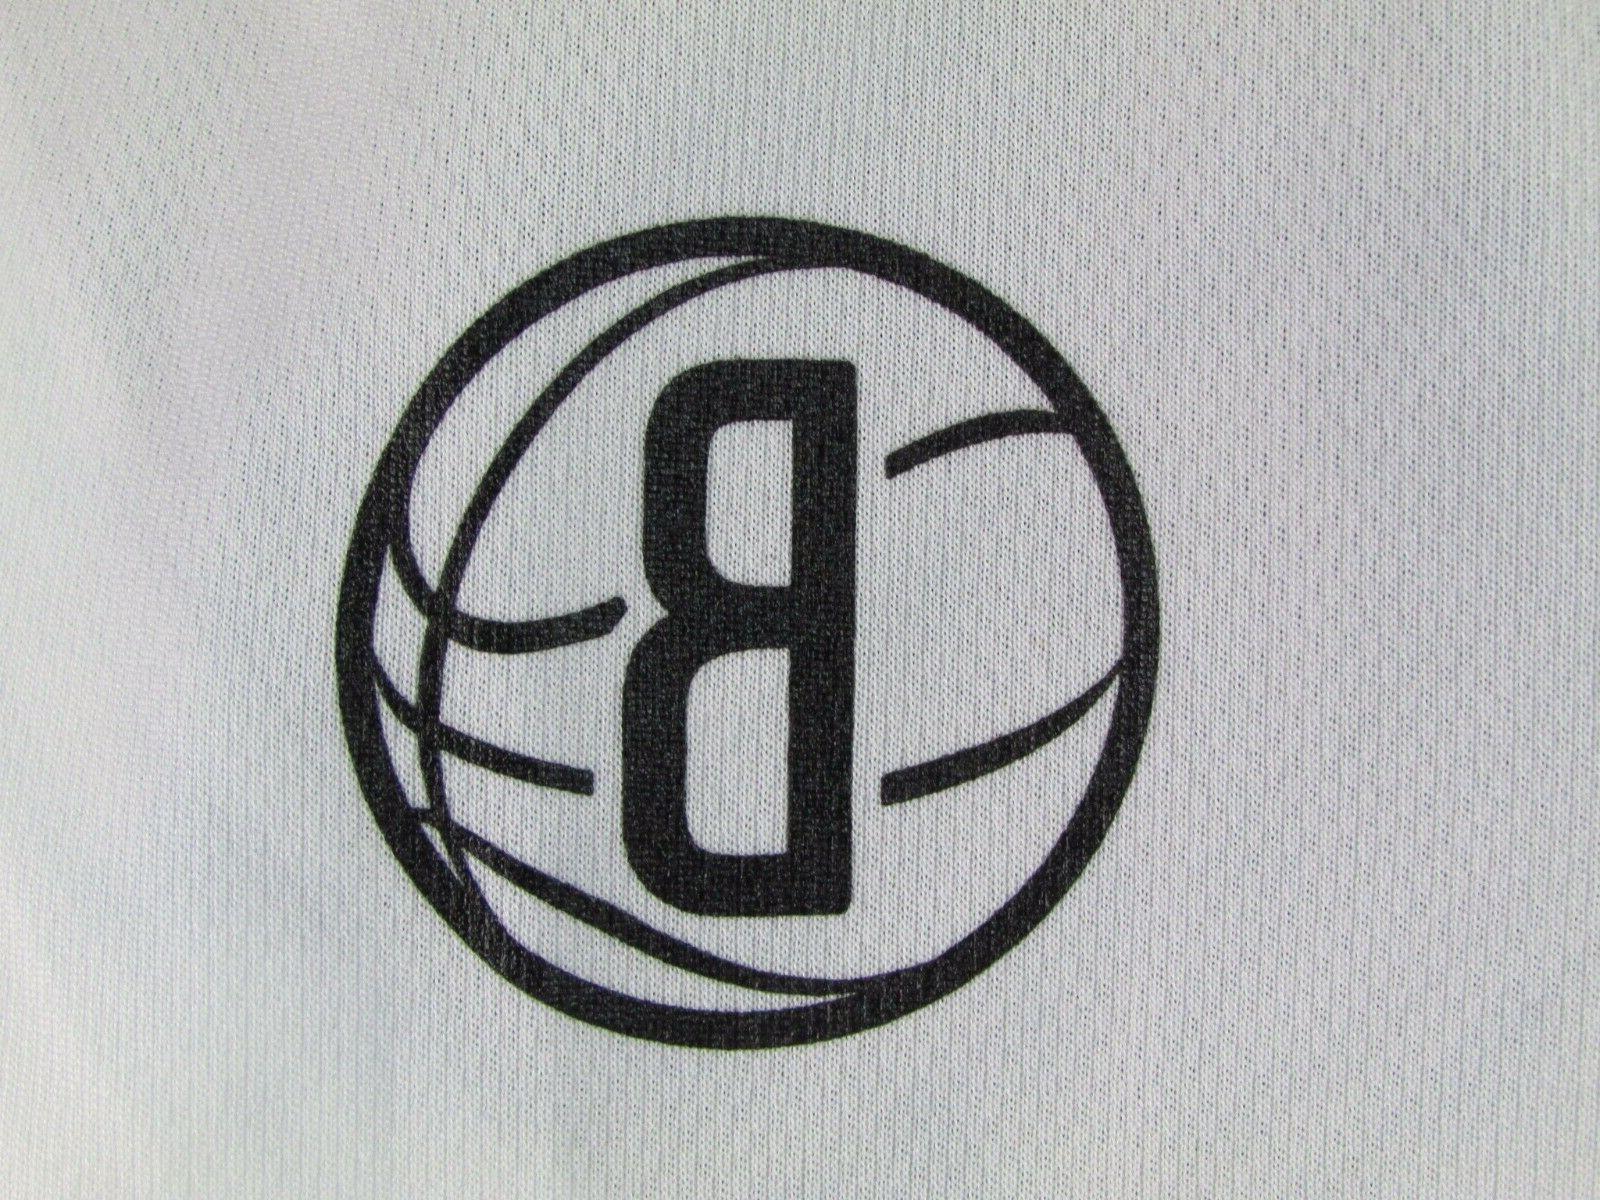 Brooklyn Basketball Jersey- Buy Get 1 Free!